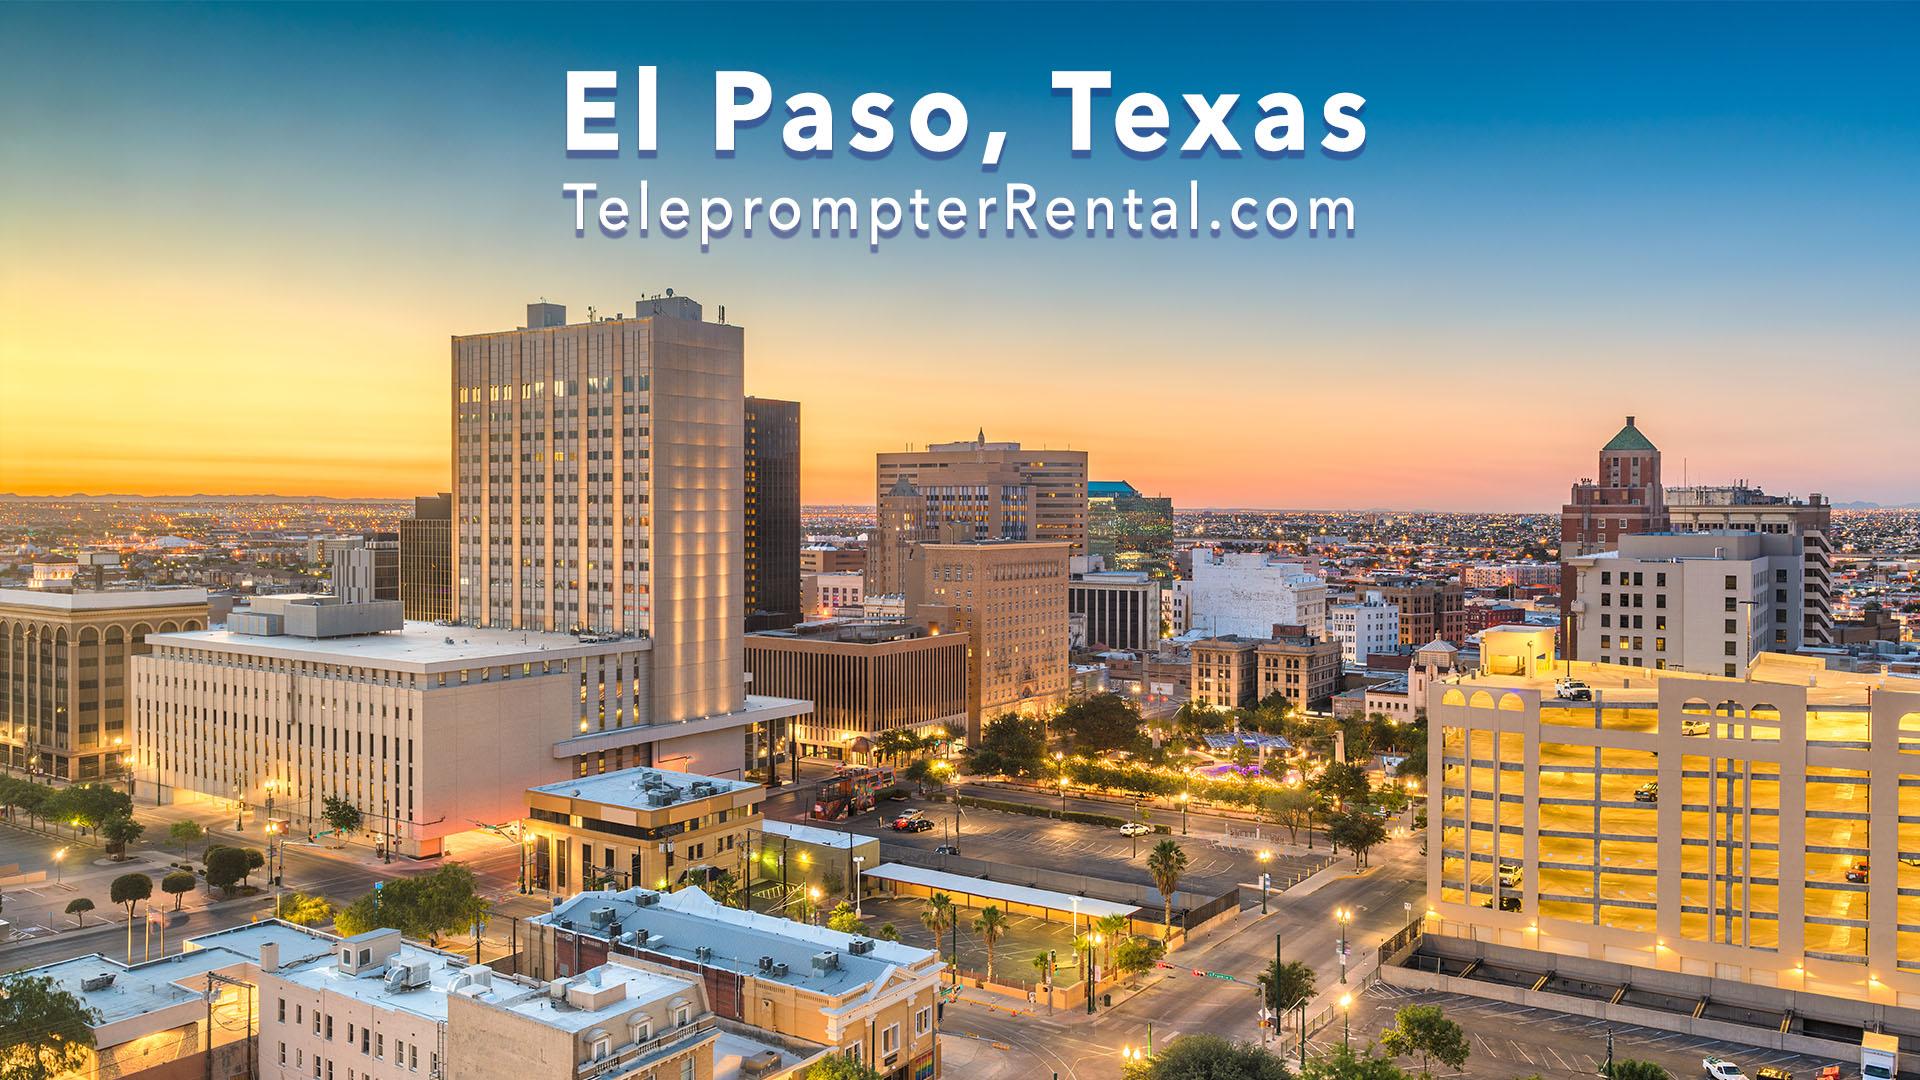 El Paso, Texas - Teleprompter Rental